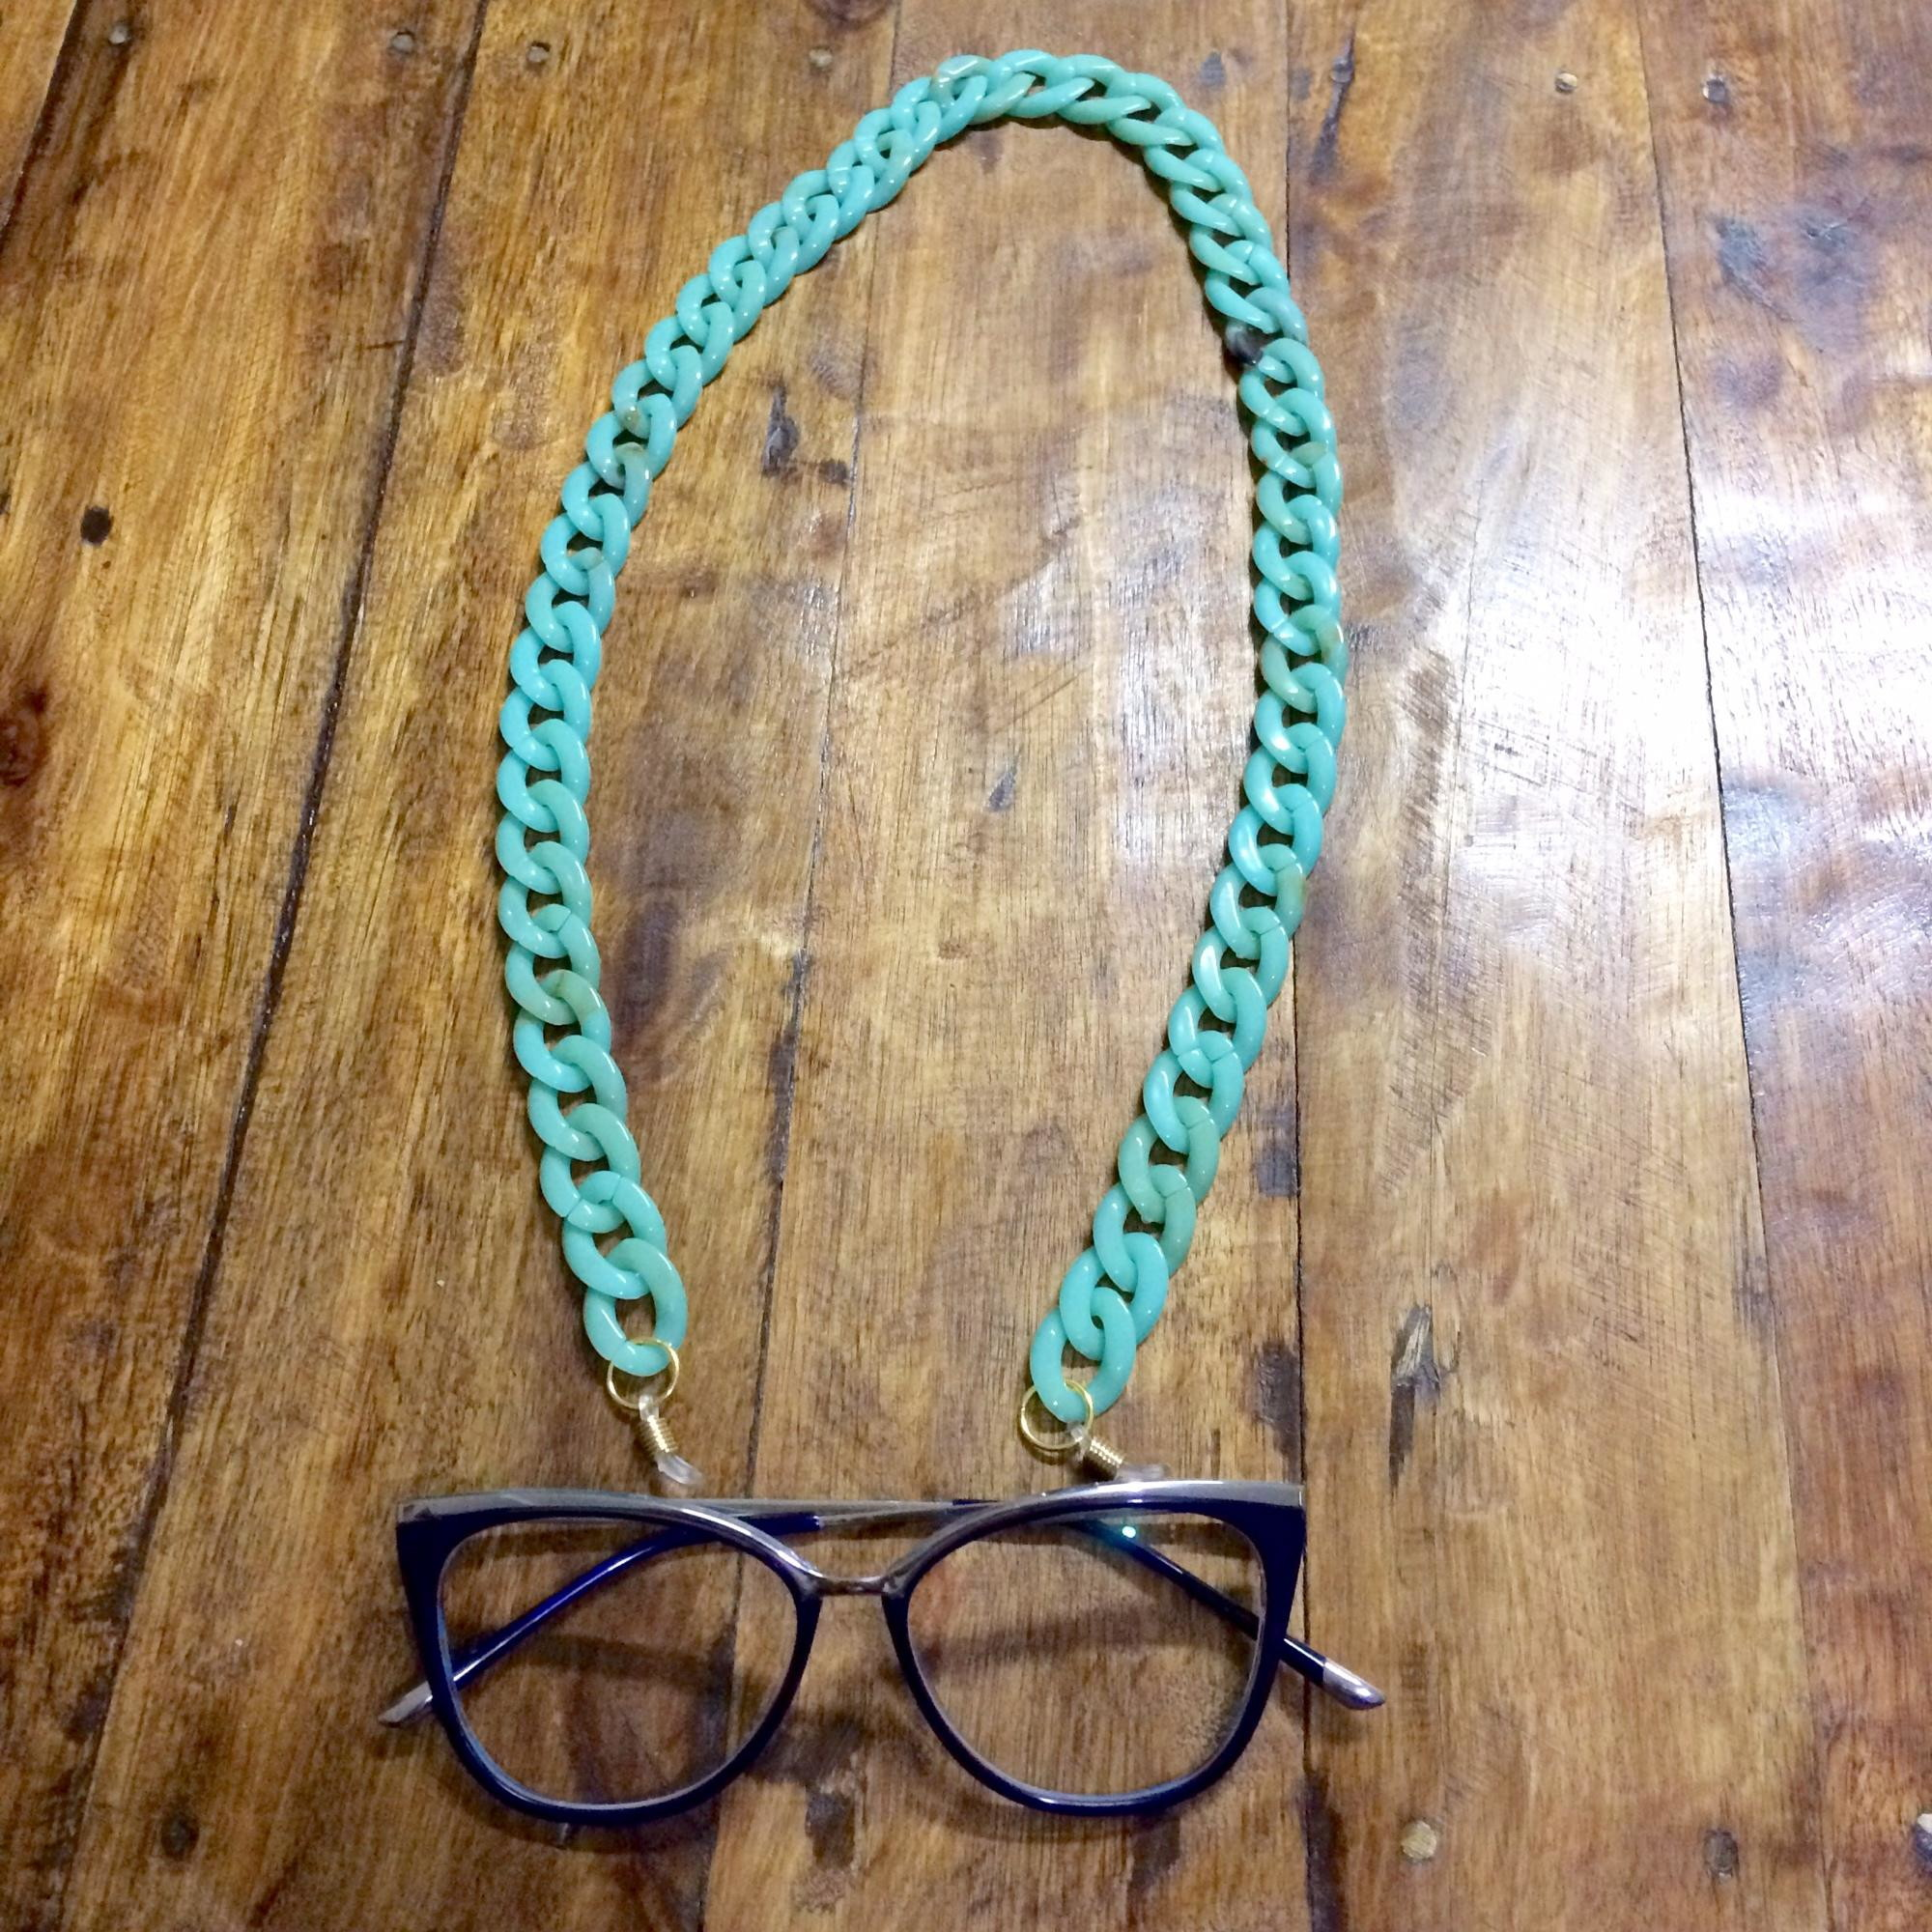 d6ab280109 Cordão para pendurar óculos no Elo7 | Carla Barranco acessórios (AAAB25)